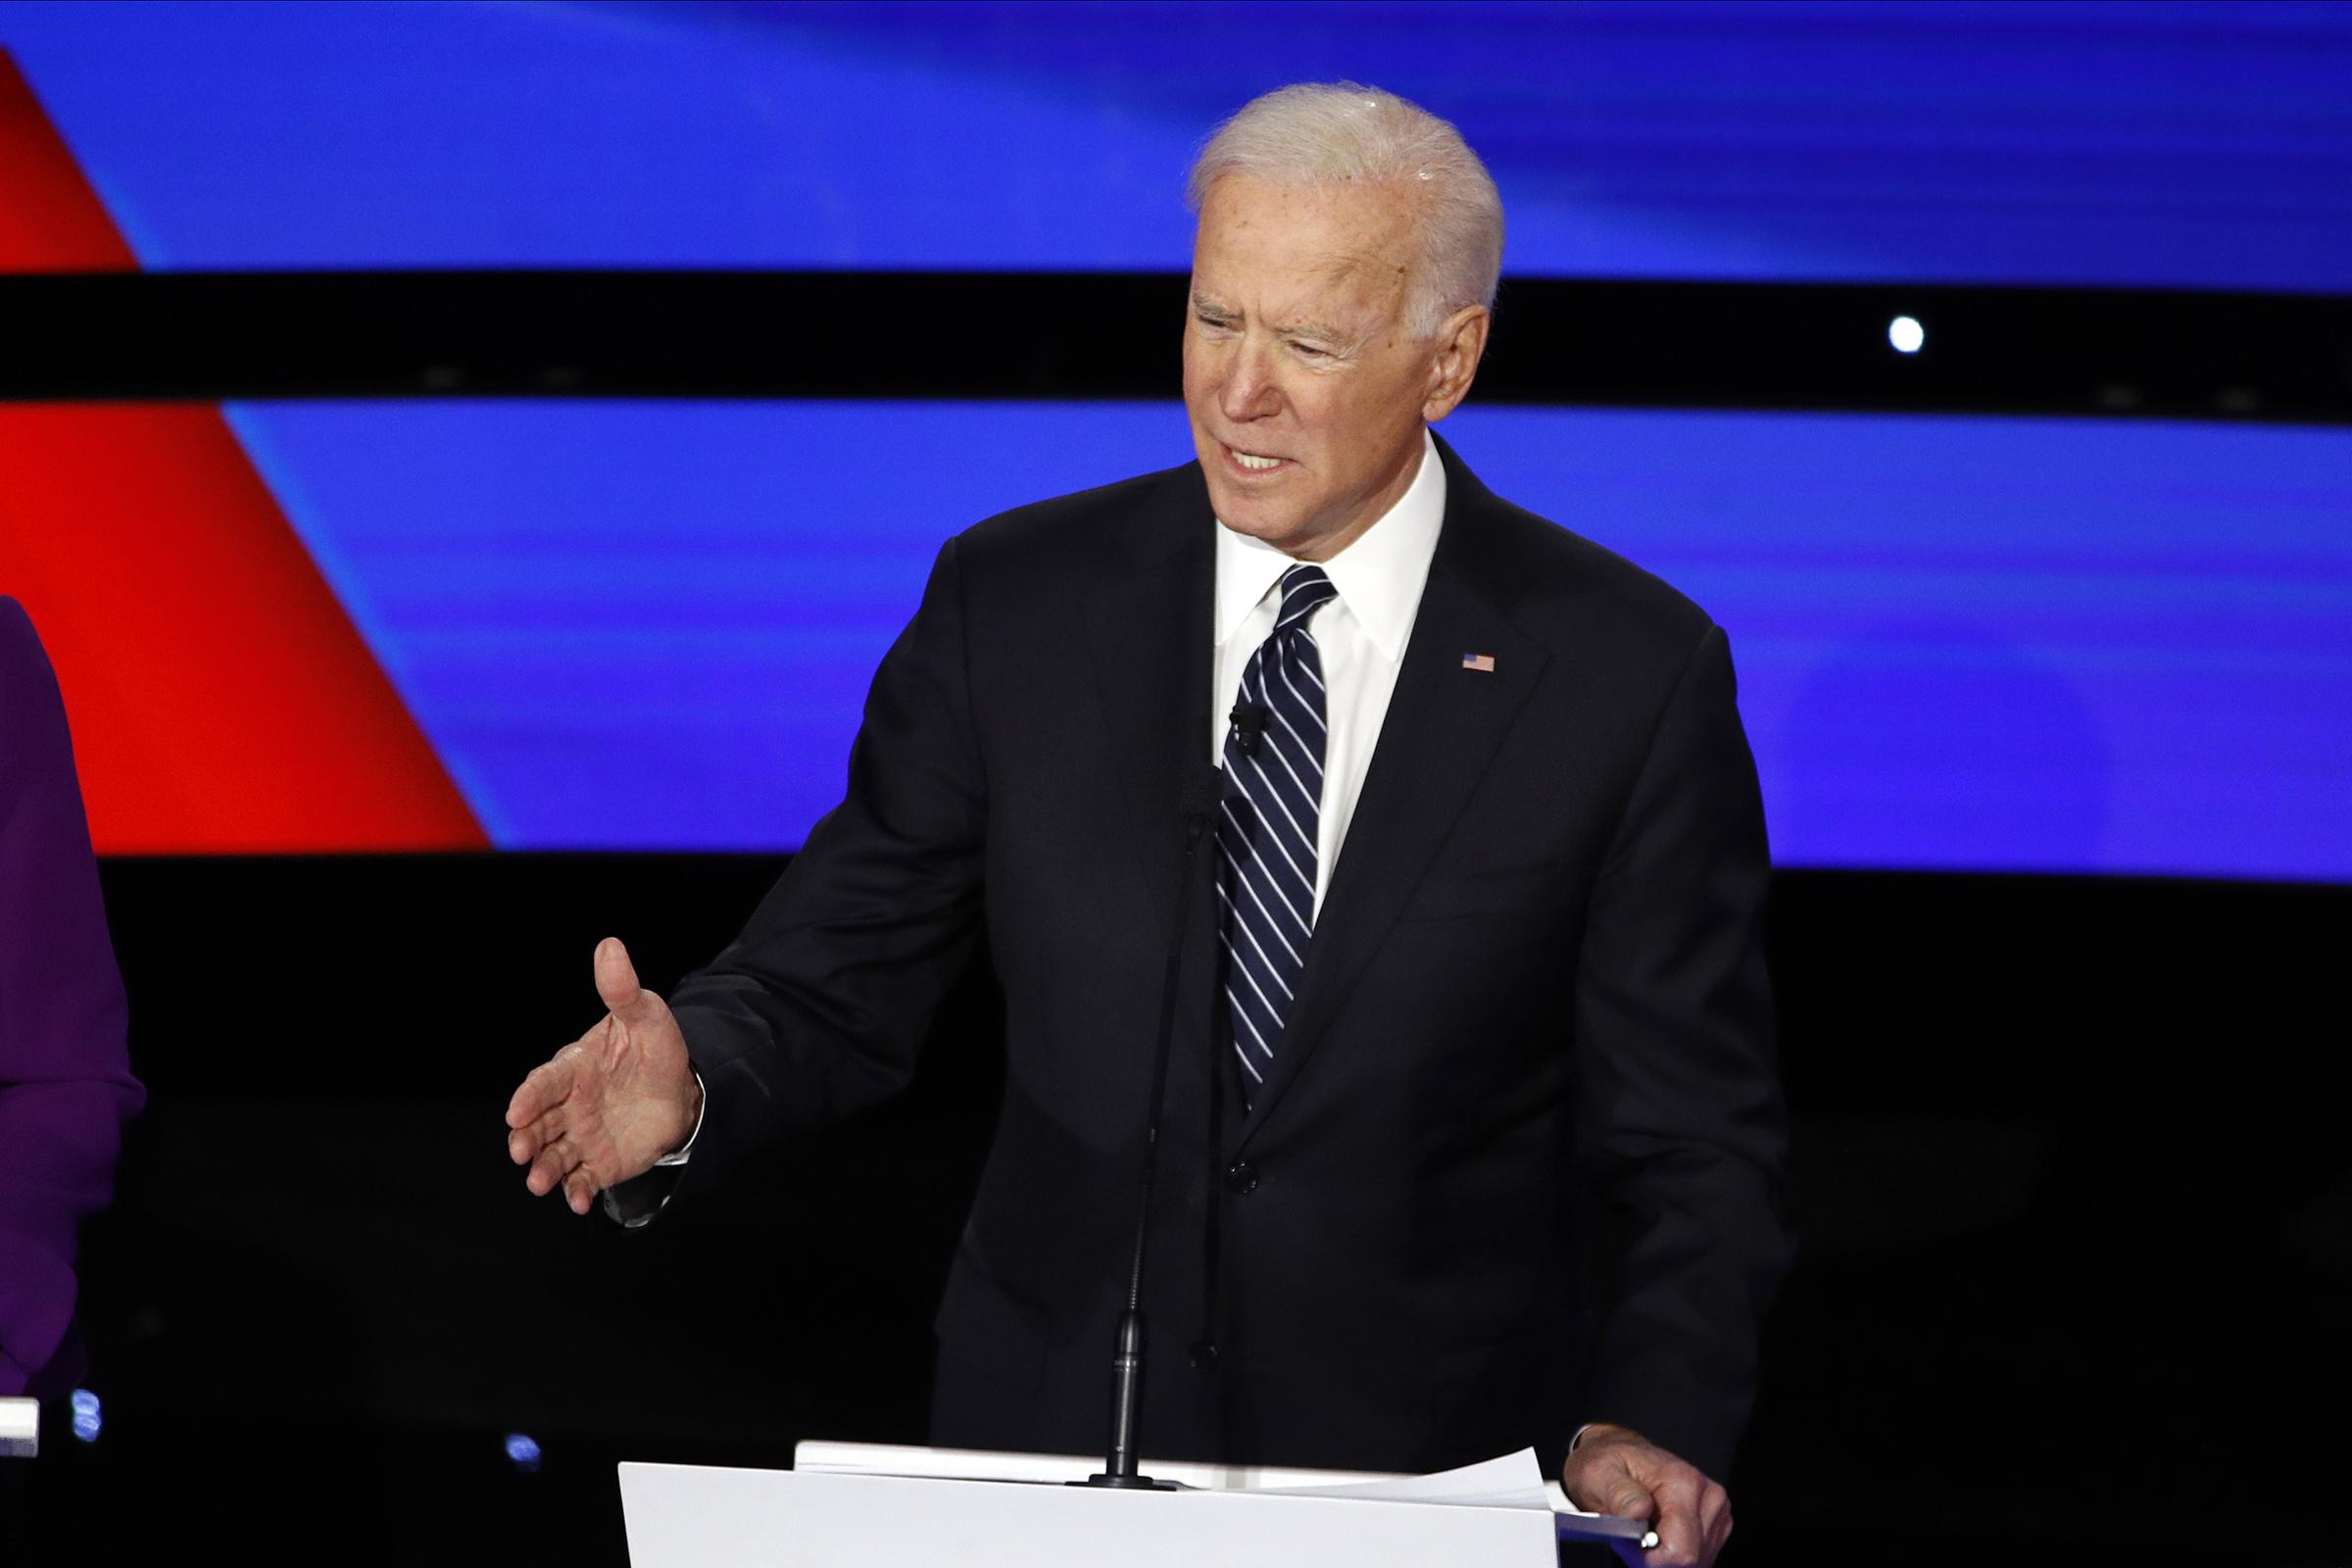 Democratic presidential candidate former Vice President Joe Biden speaks during a Democratic presidential primary debate in Des Moines, Iowa on Jan. 14, 2020.